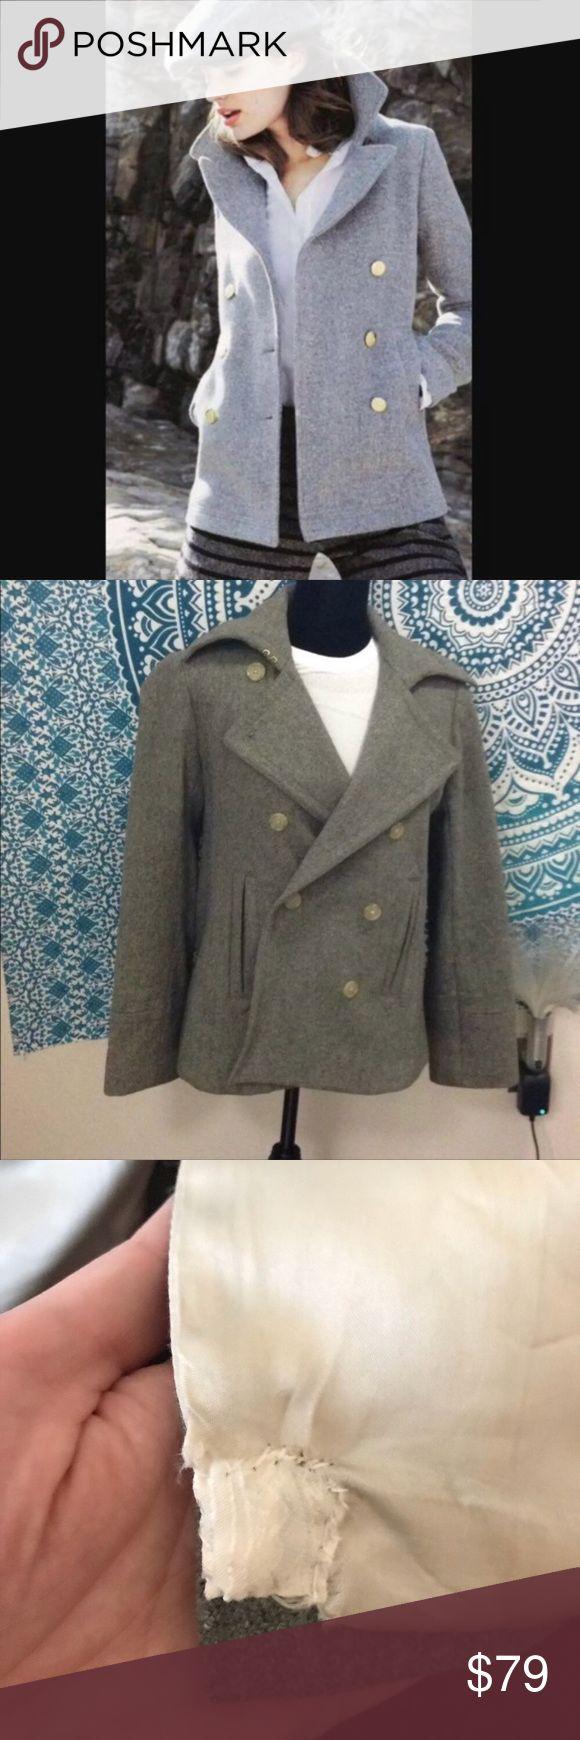 Jcrew 100 Wool Pea Coat 100 wool which is hard to find